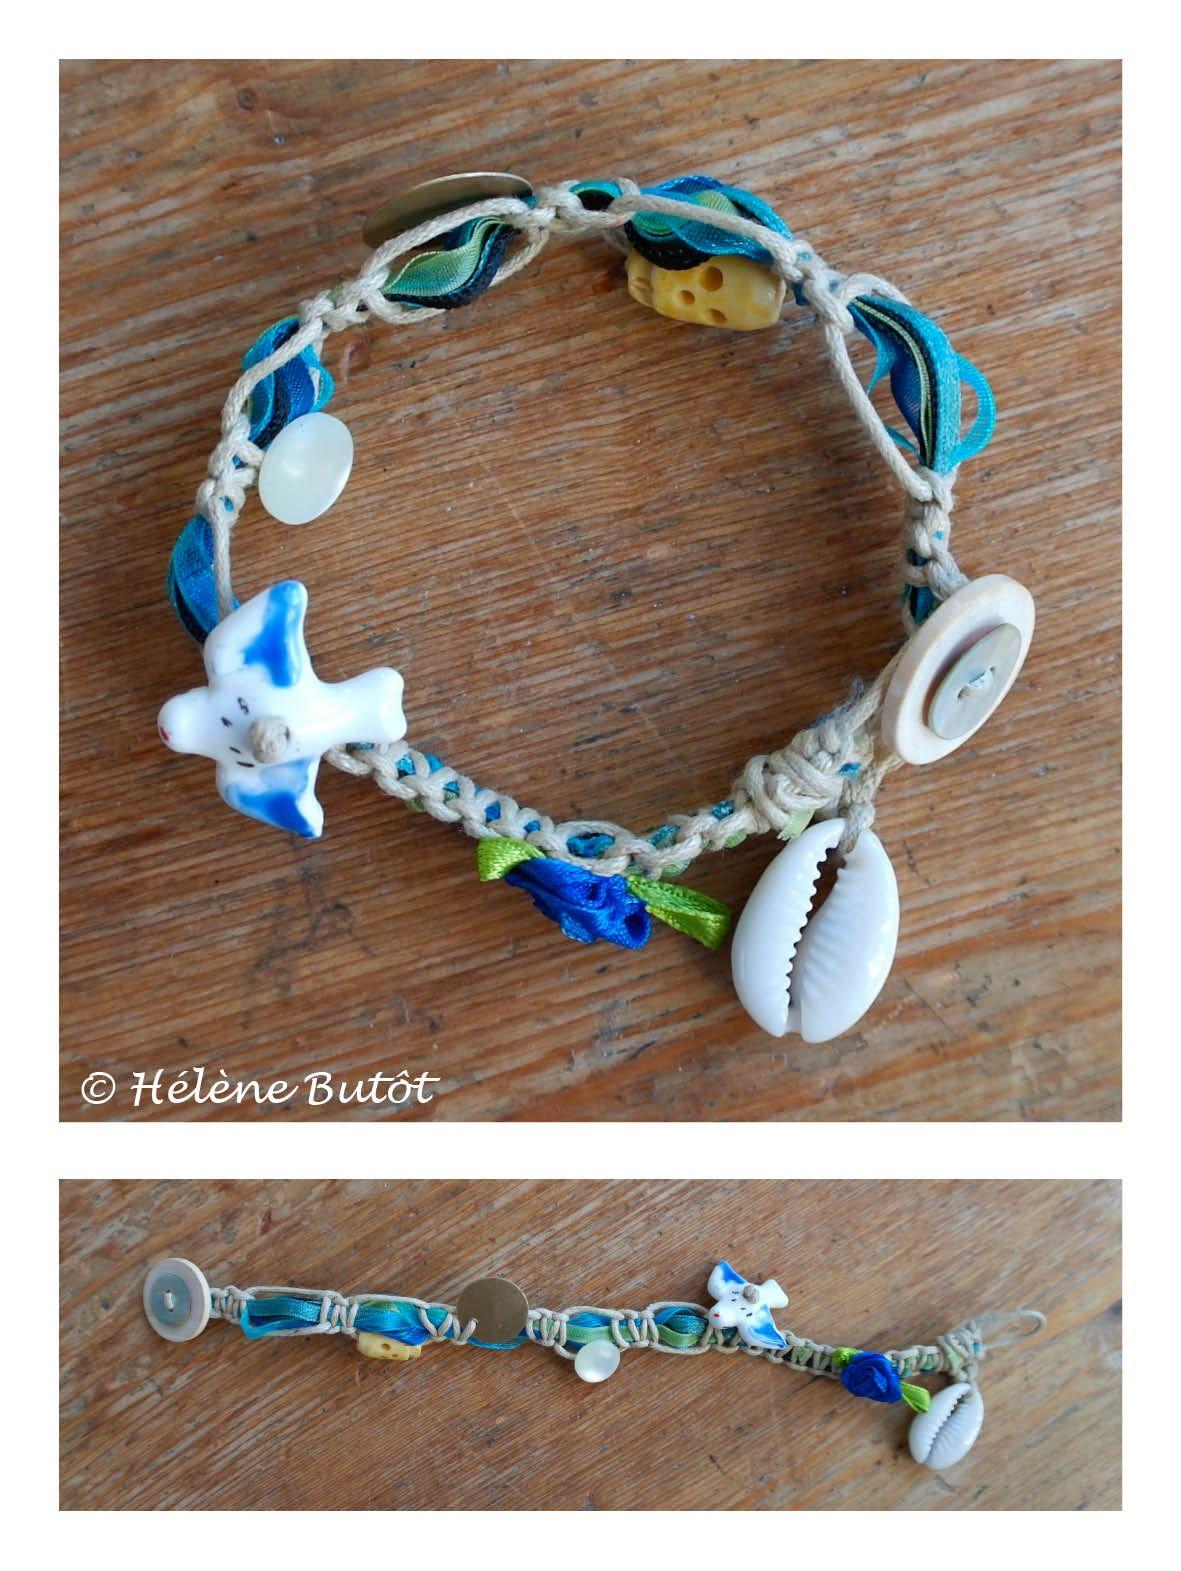 Made by hélène butôt very nice jewerly pinterest jewerly and om